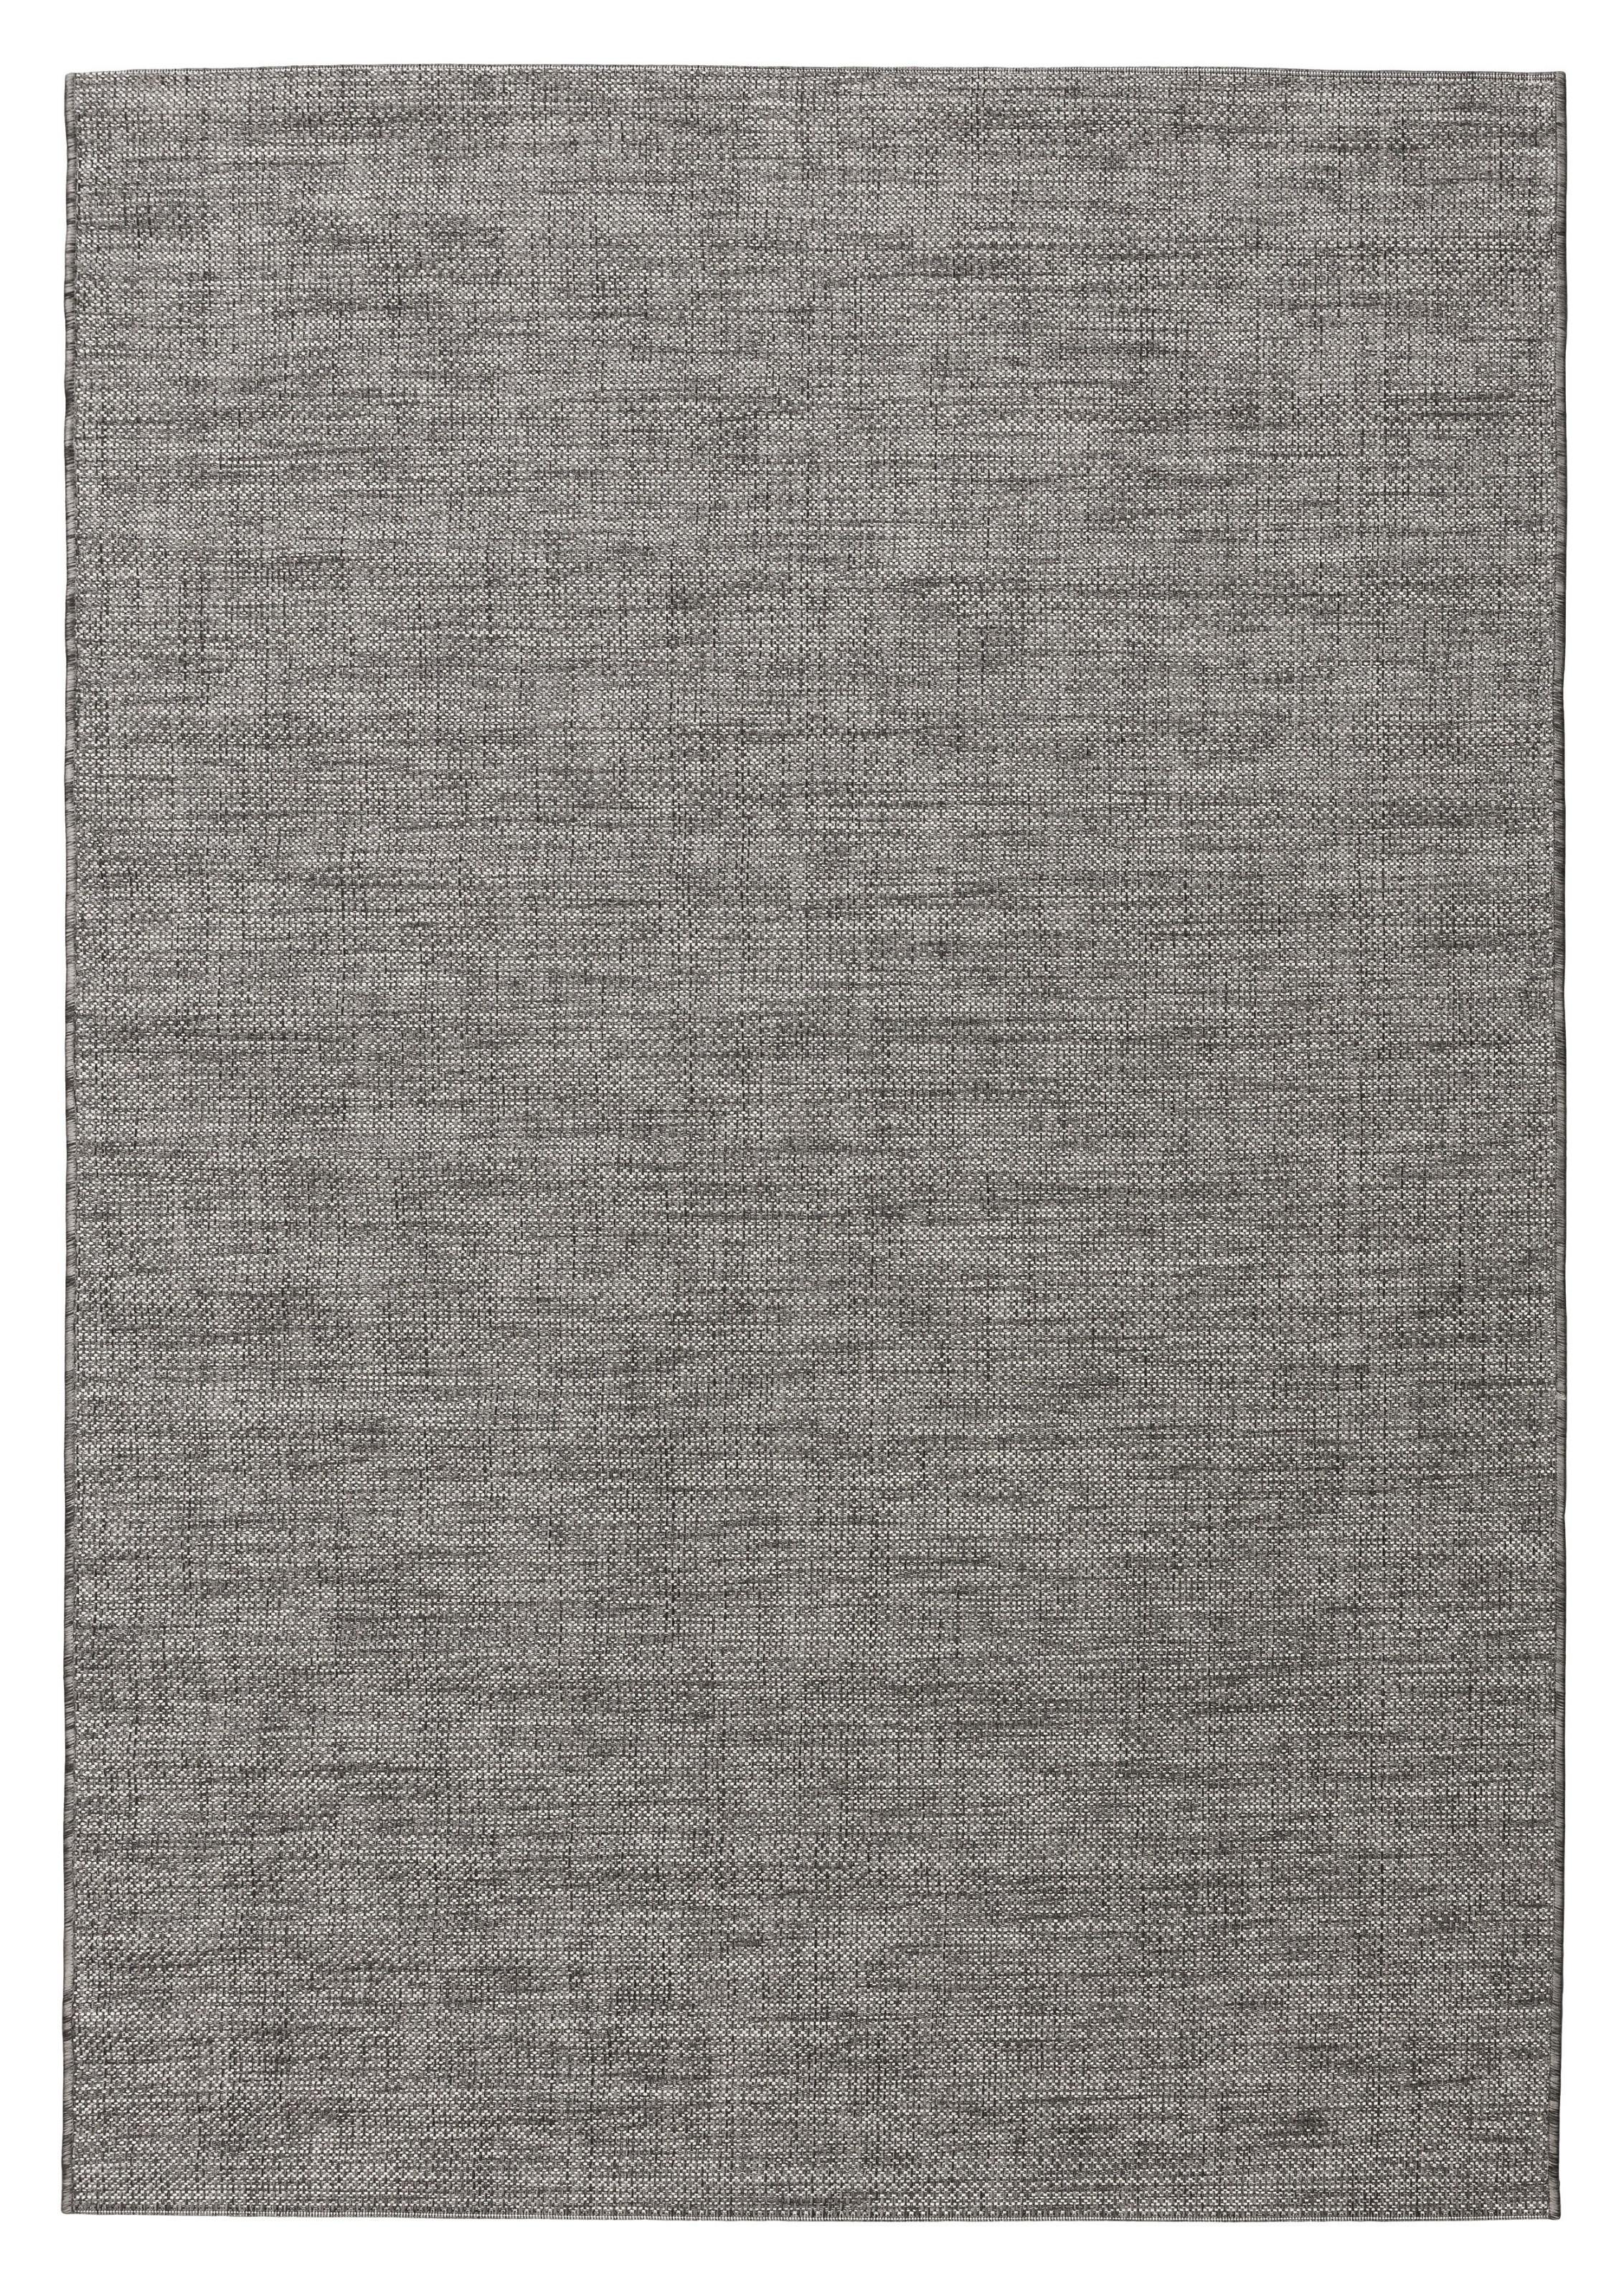 Astra - Golze koberce Kusový koberec Rho 190040 Anthracite - 120x170 cm